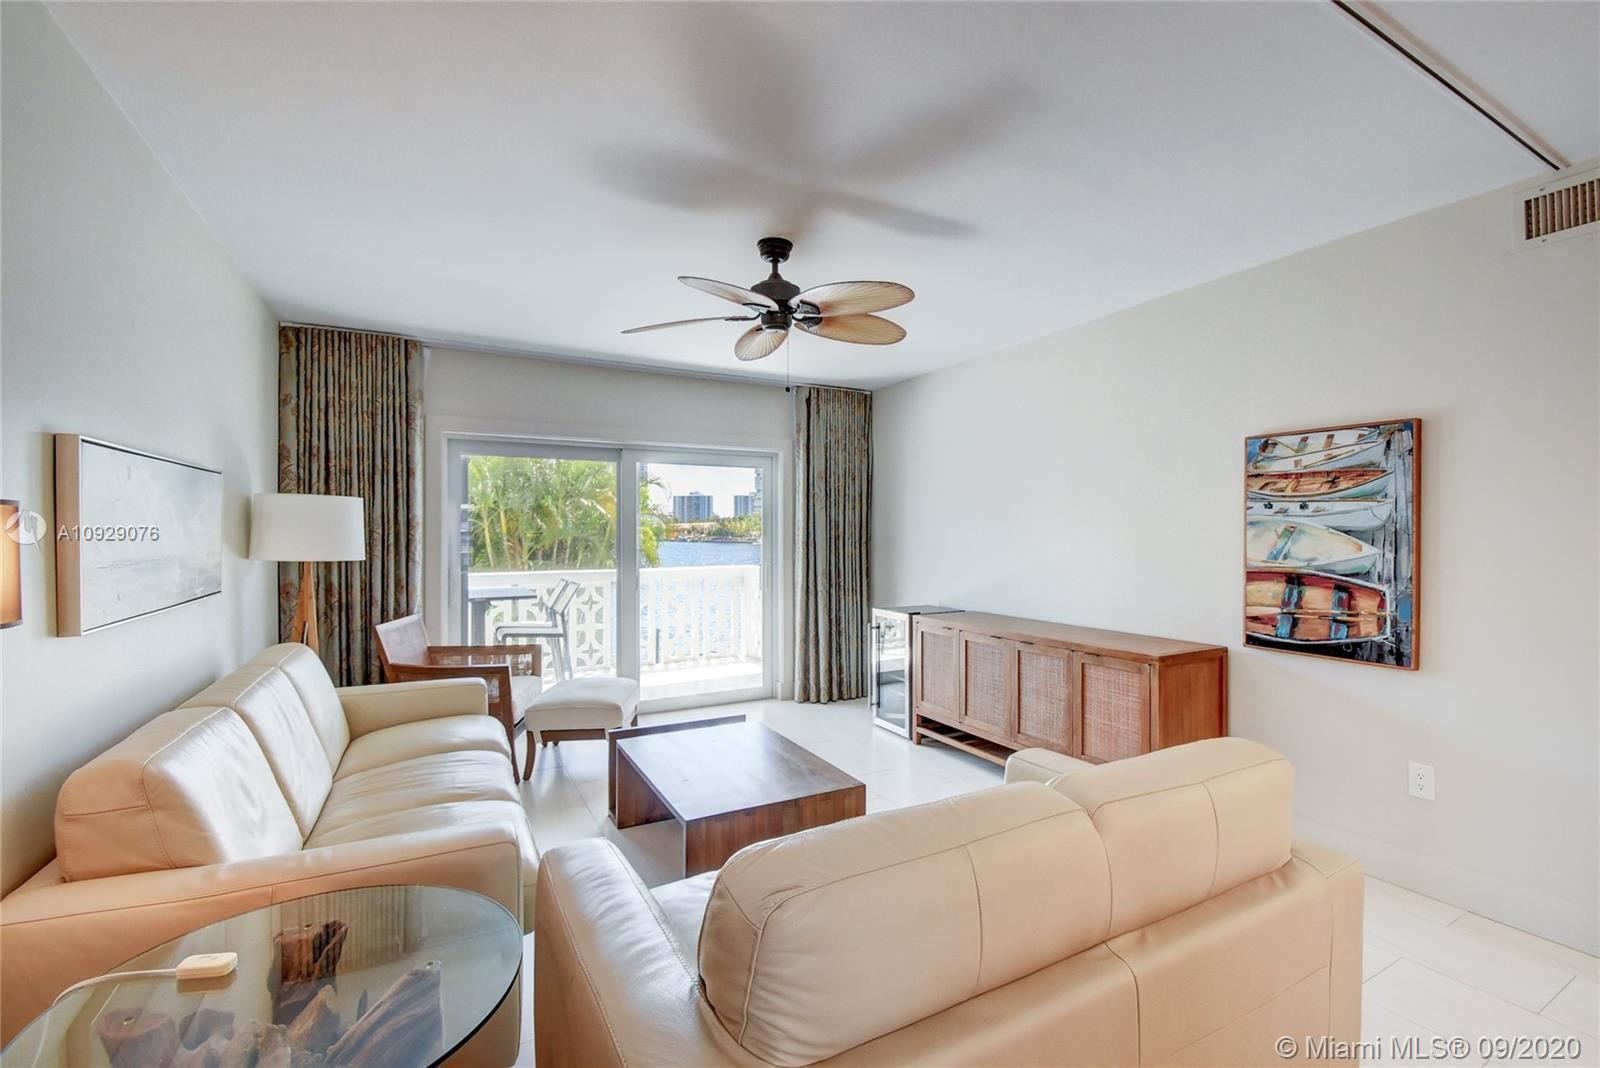 Photo of 3209 S Ocean Dr #2I, Hallandale Beach, FL 33009 (MLS # A10929076)